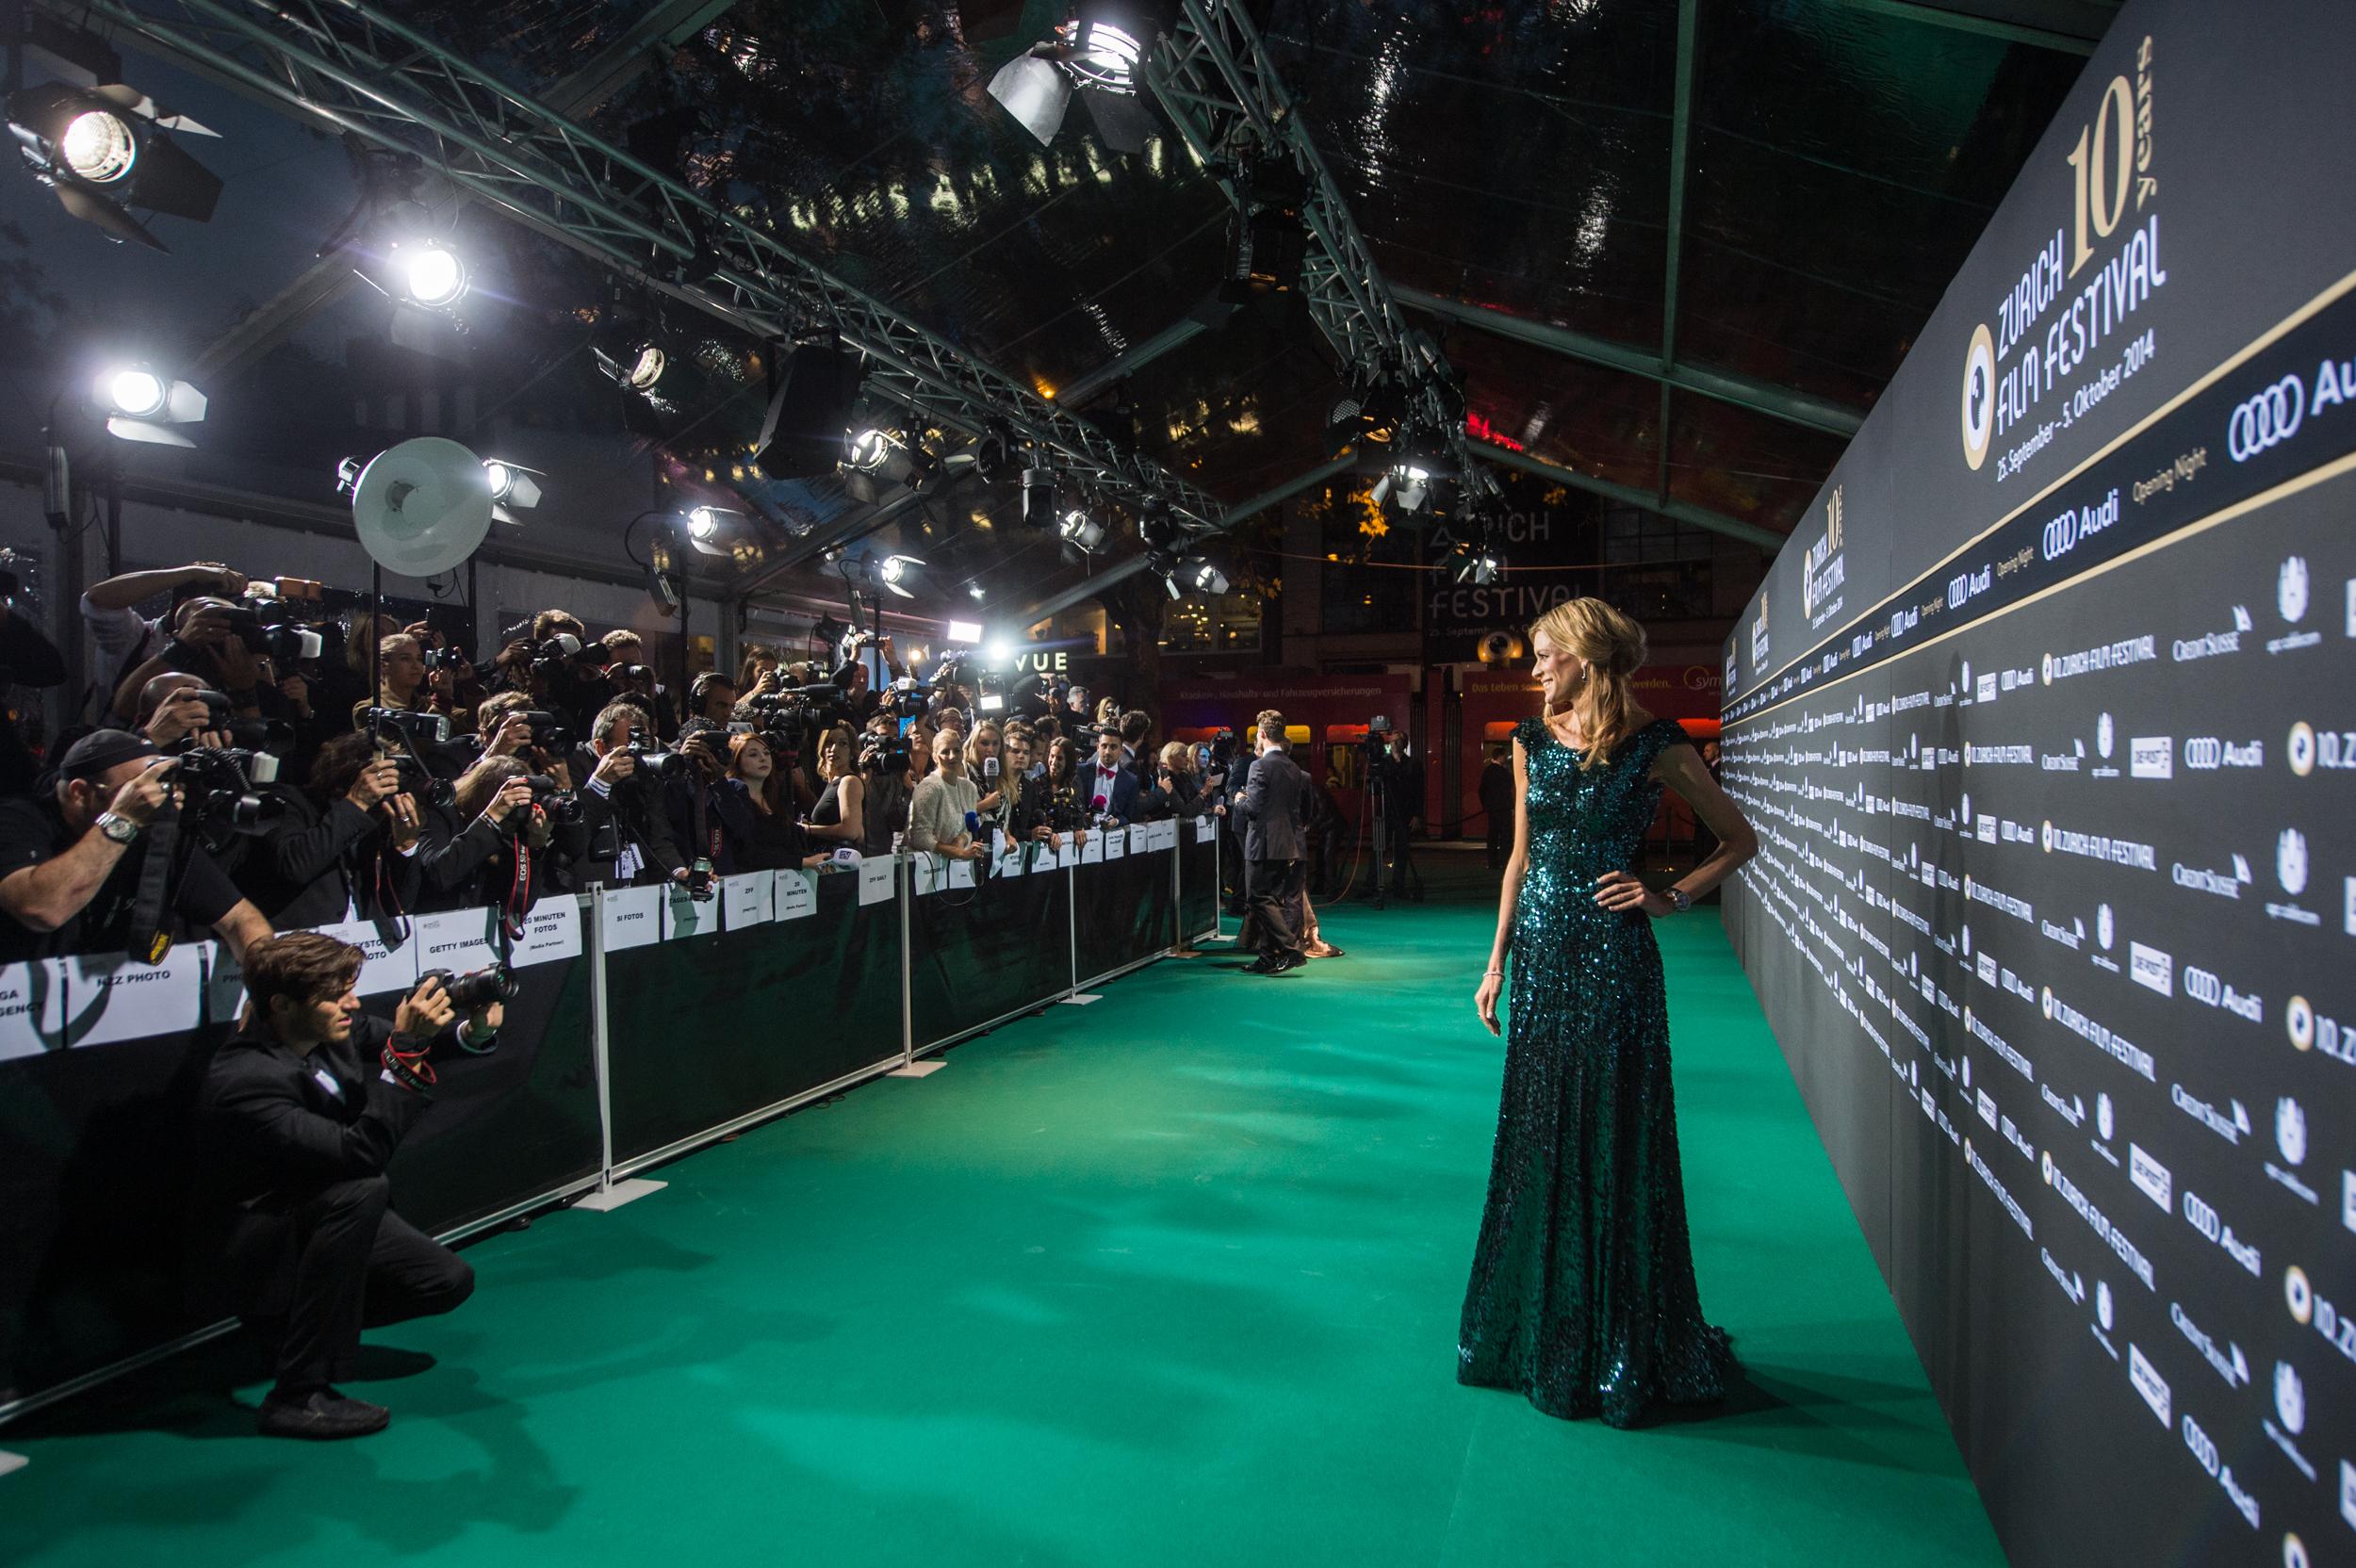 Zurich Film Festival 2015 essential guide